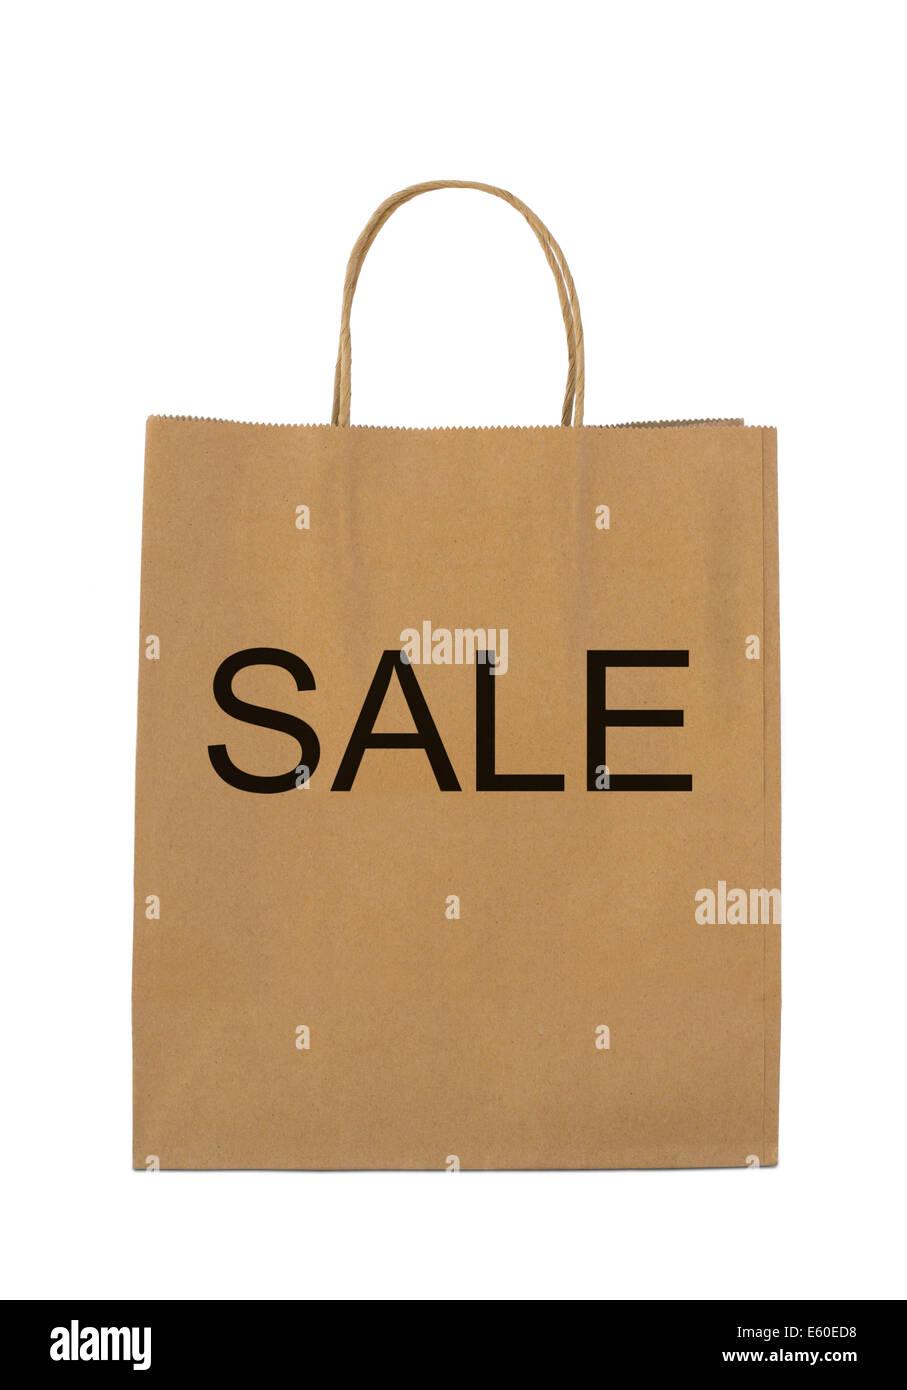 'Sale' on brown shopping bag - Stock Image